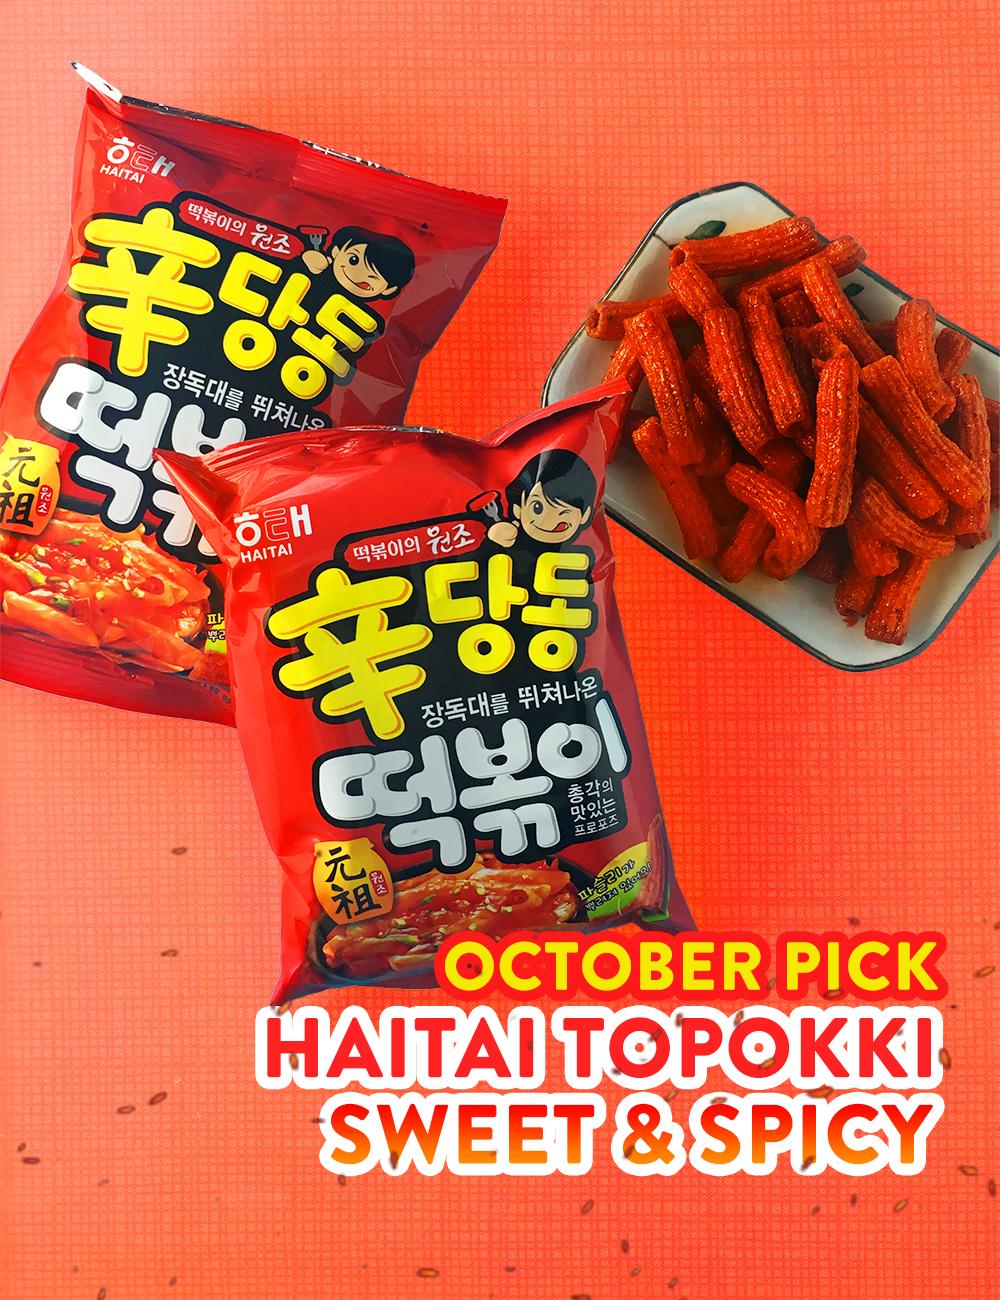 OCTOBER PICK